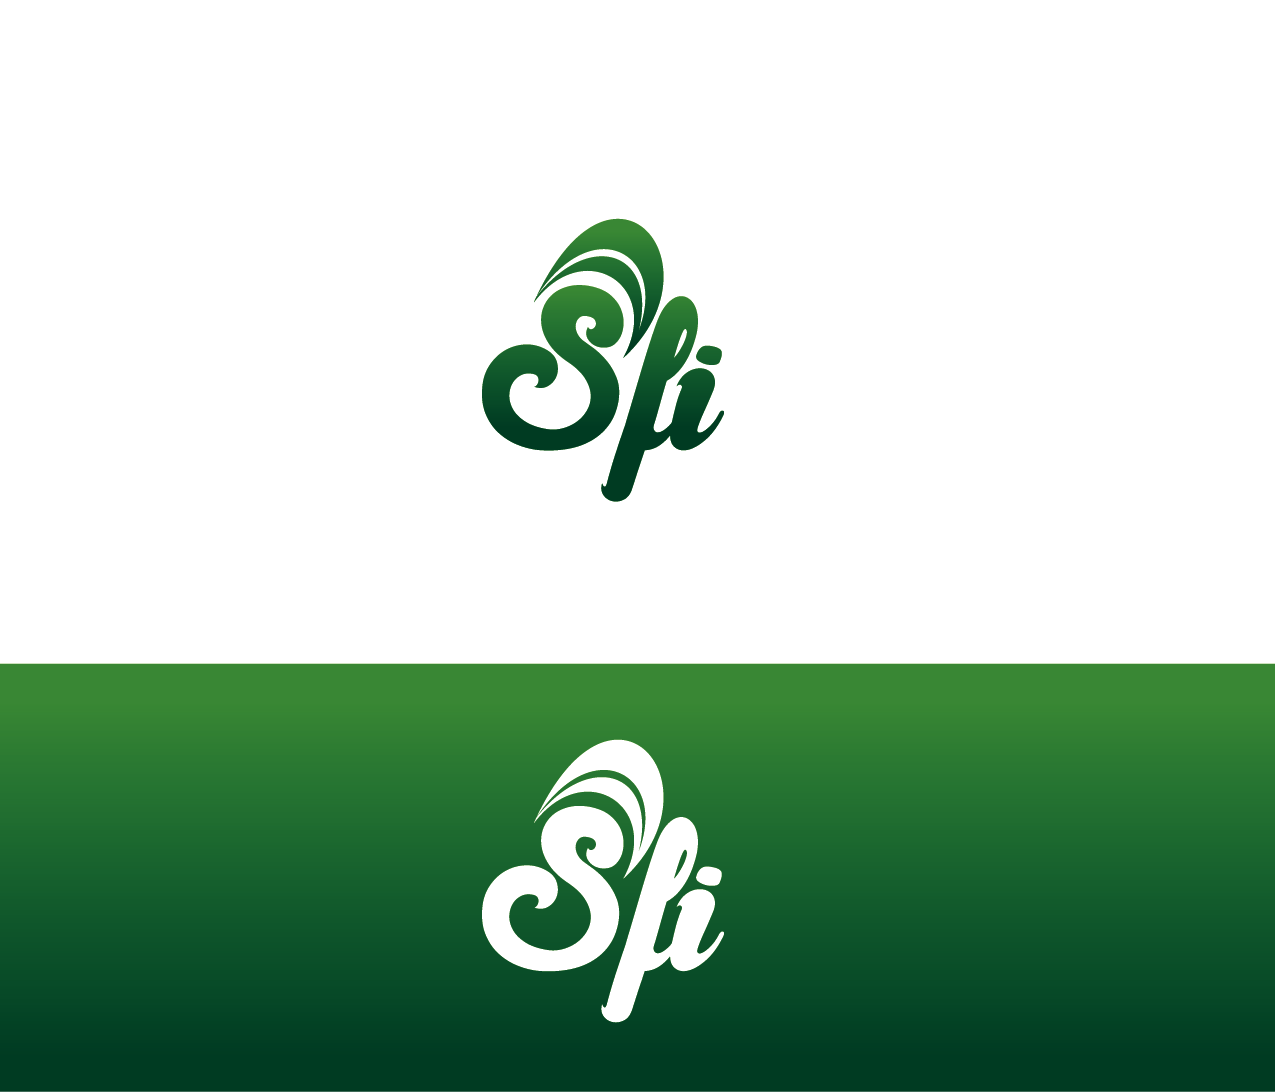 Logo Design by Private User - Entry No. 130 in the Logo Design Contest Inspiring Logo Design for SFI.